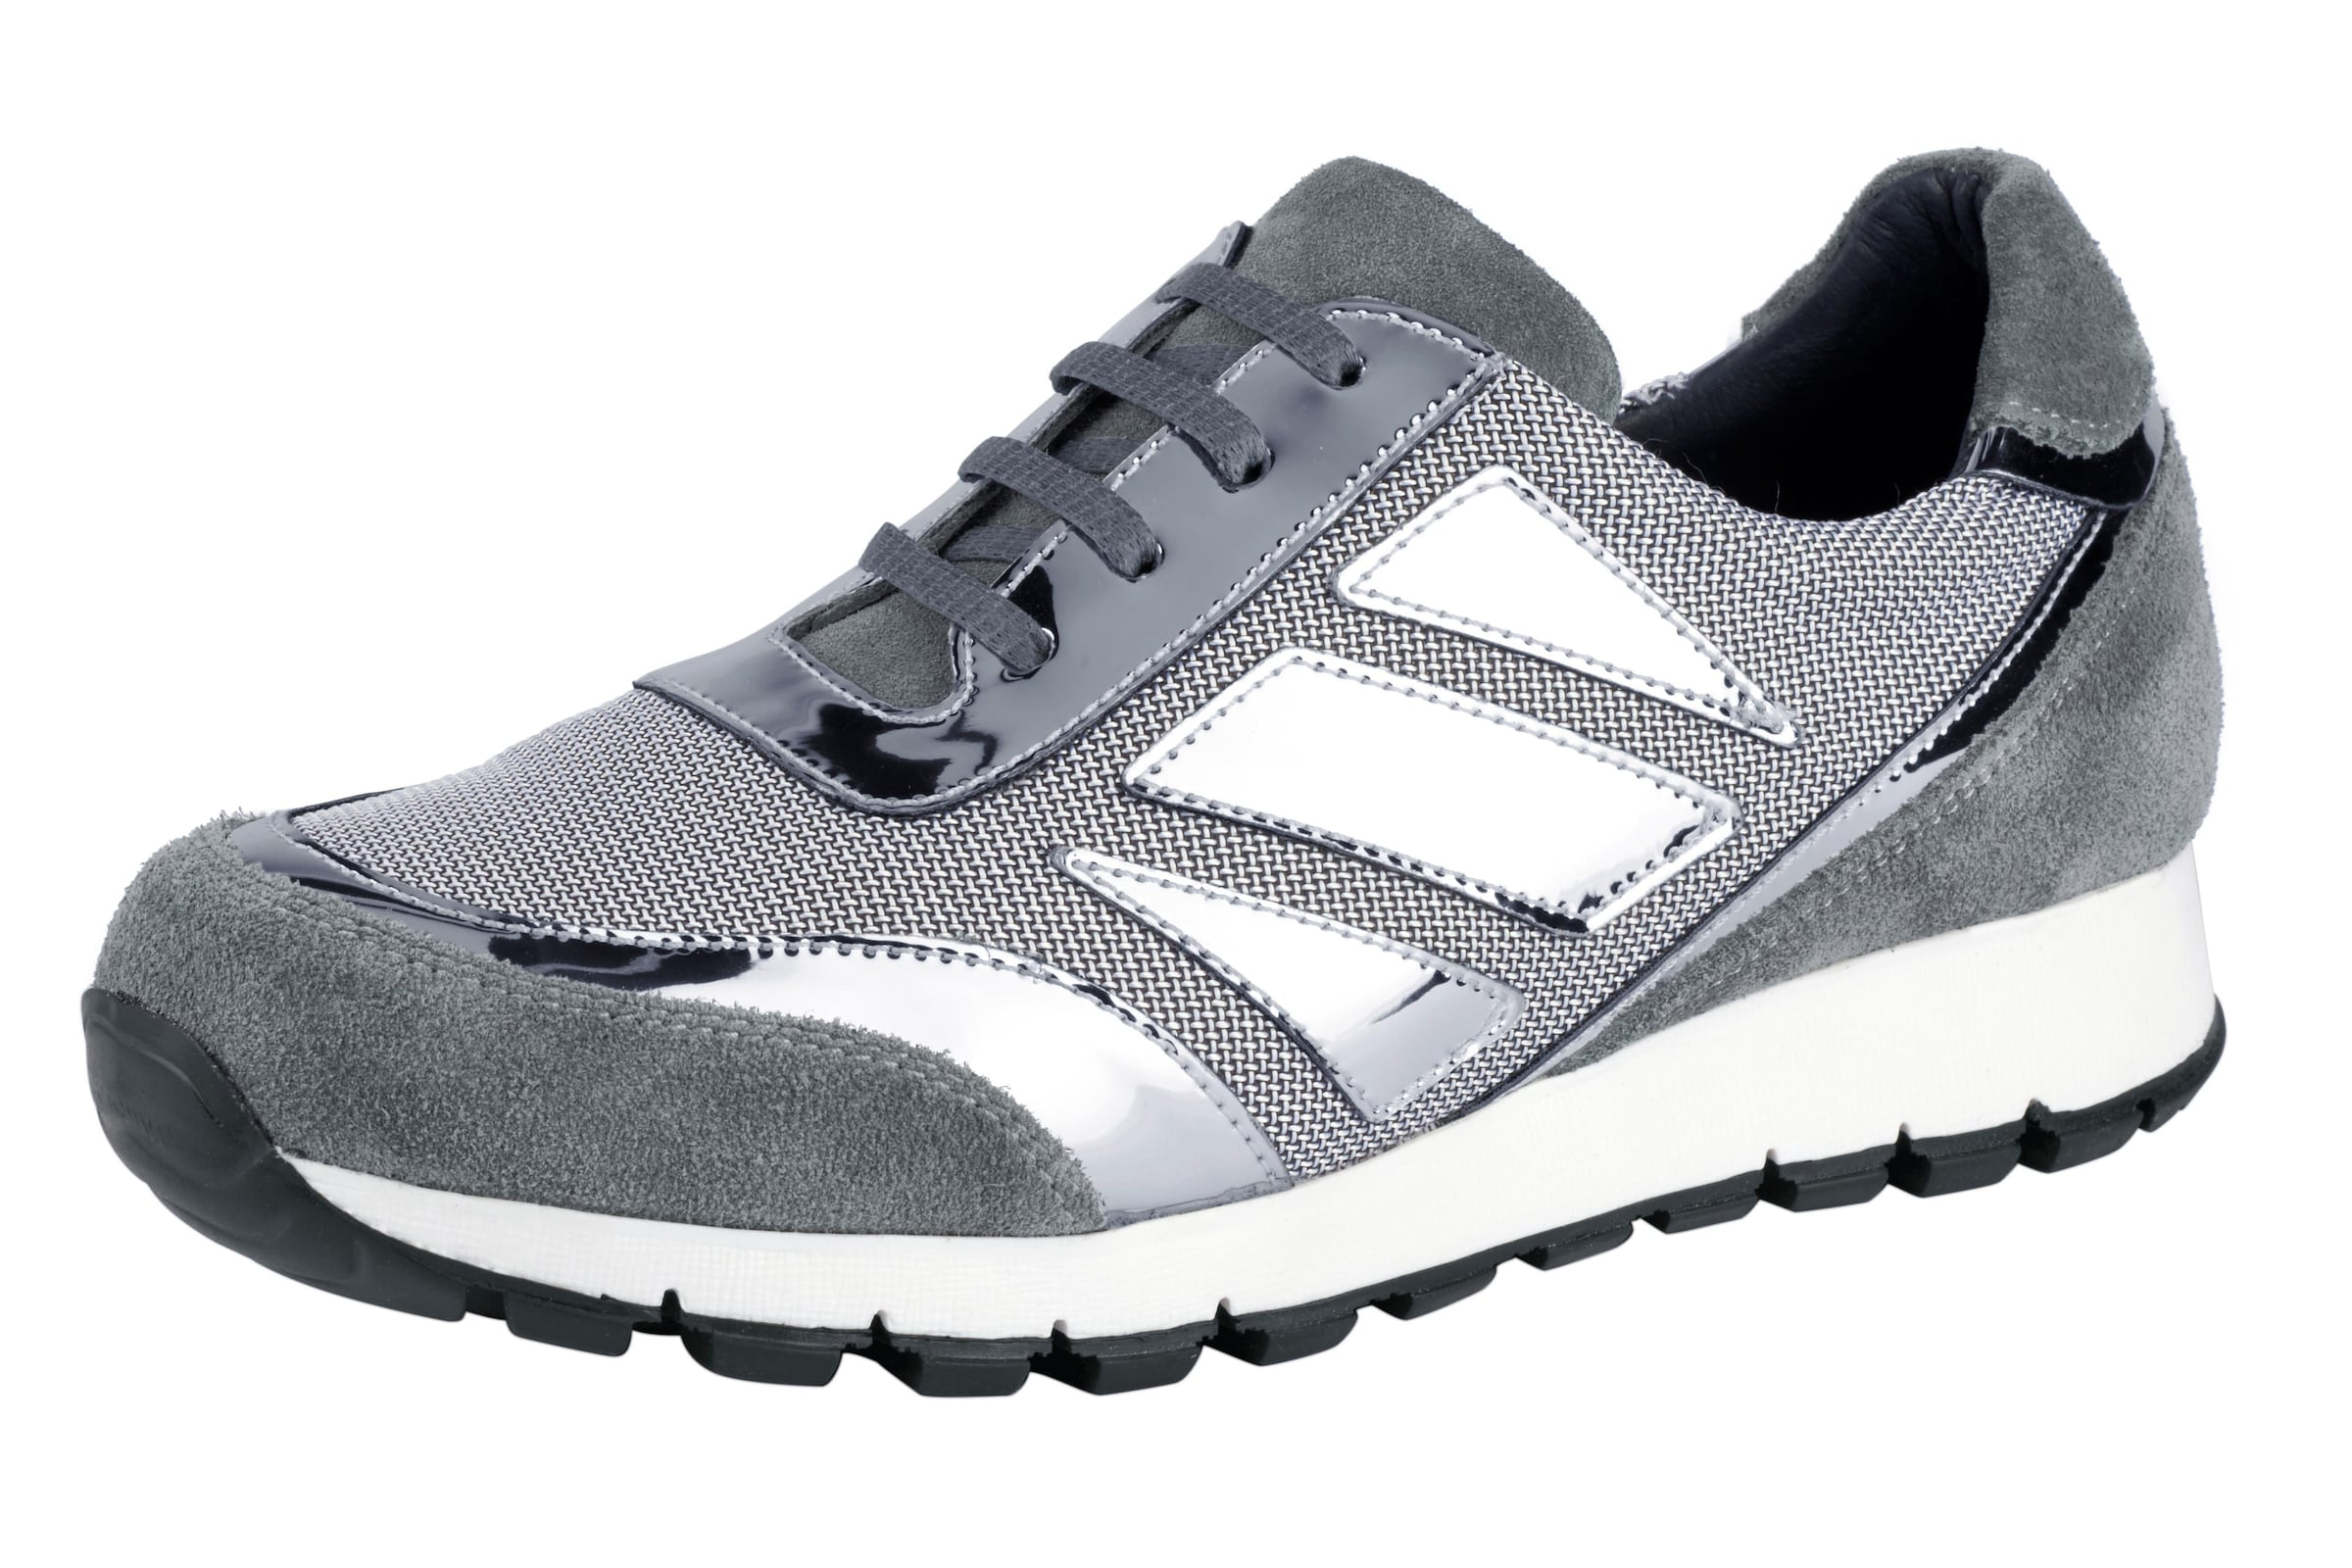 ANDREA CONTI Sneaker Verschleißfeste billige Schuhe